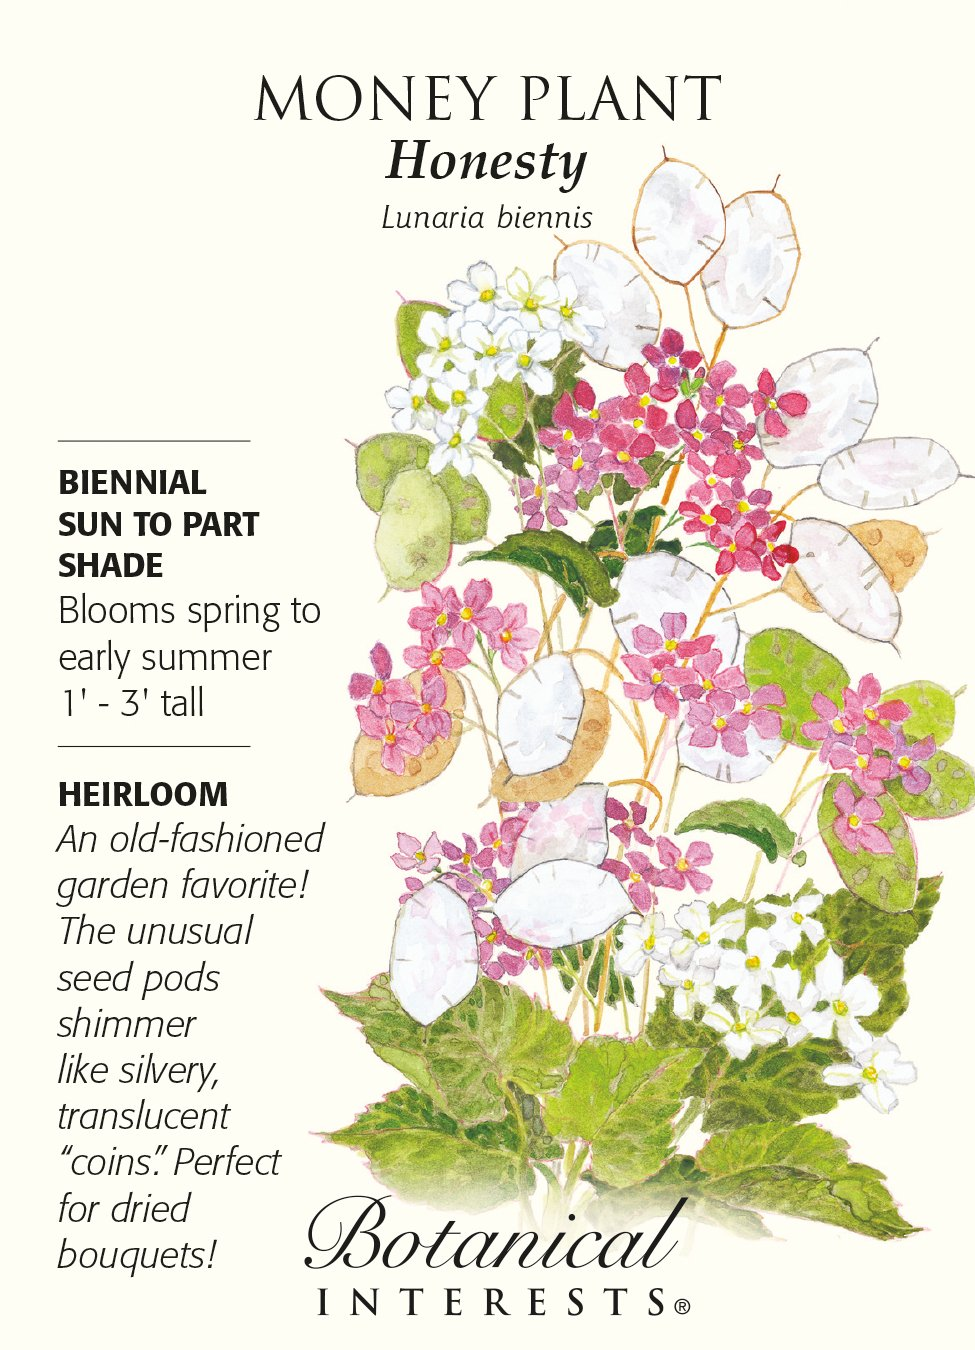 Amazon.com : Money Plant Honesty Heirloom Seeds 60 Seeds : Cress ...